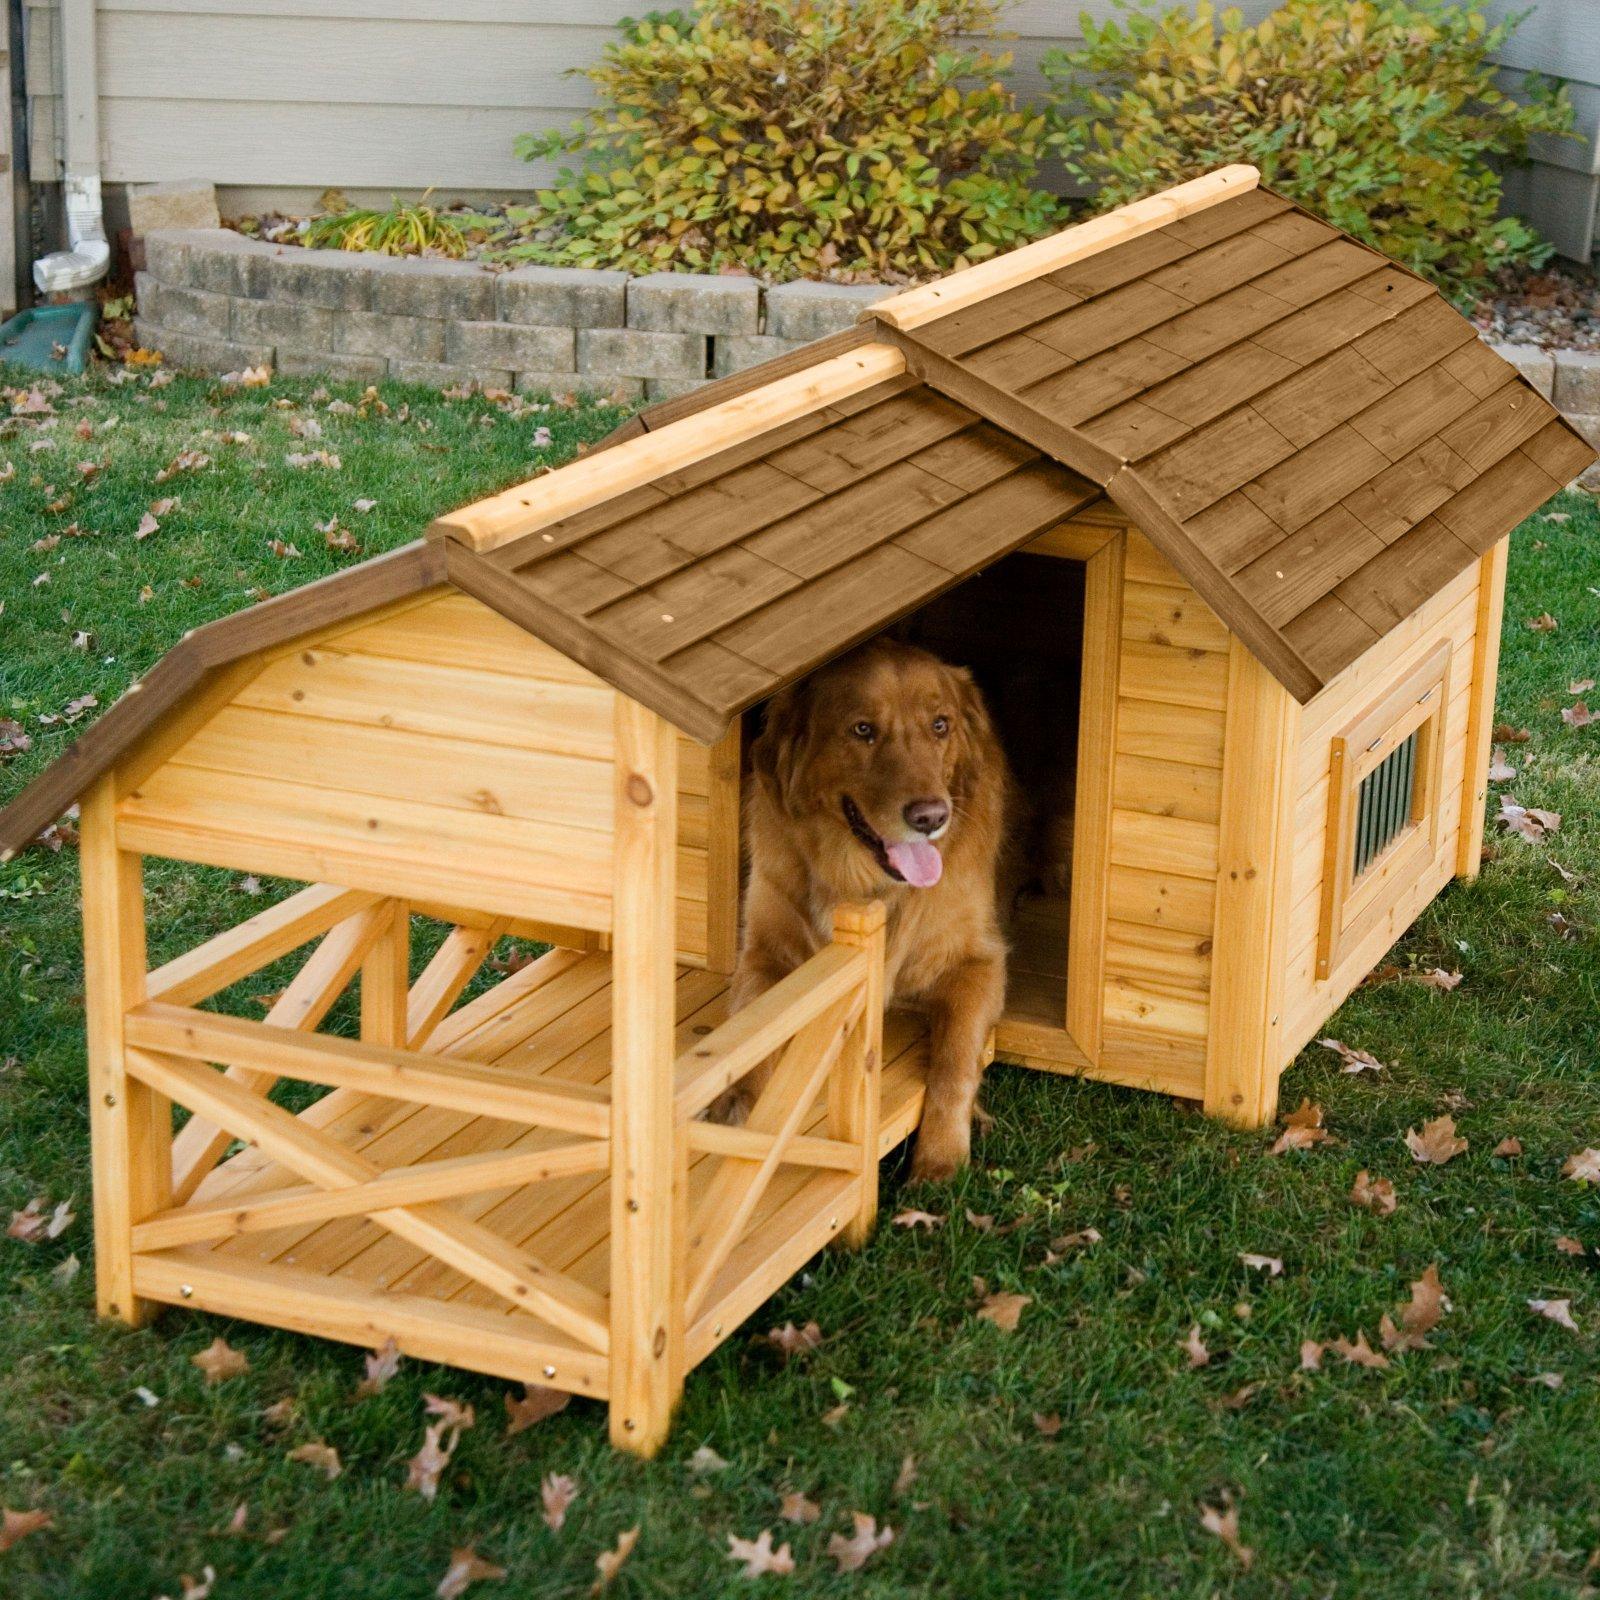 Boomer & George Wooden Barn Dog House